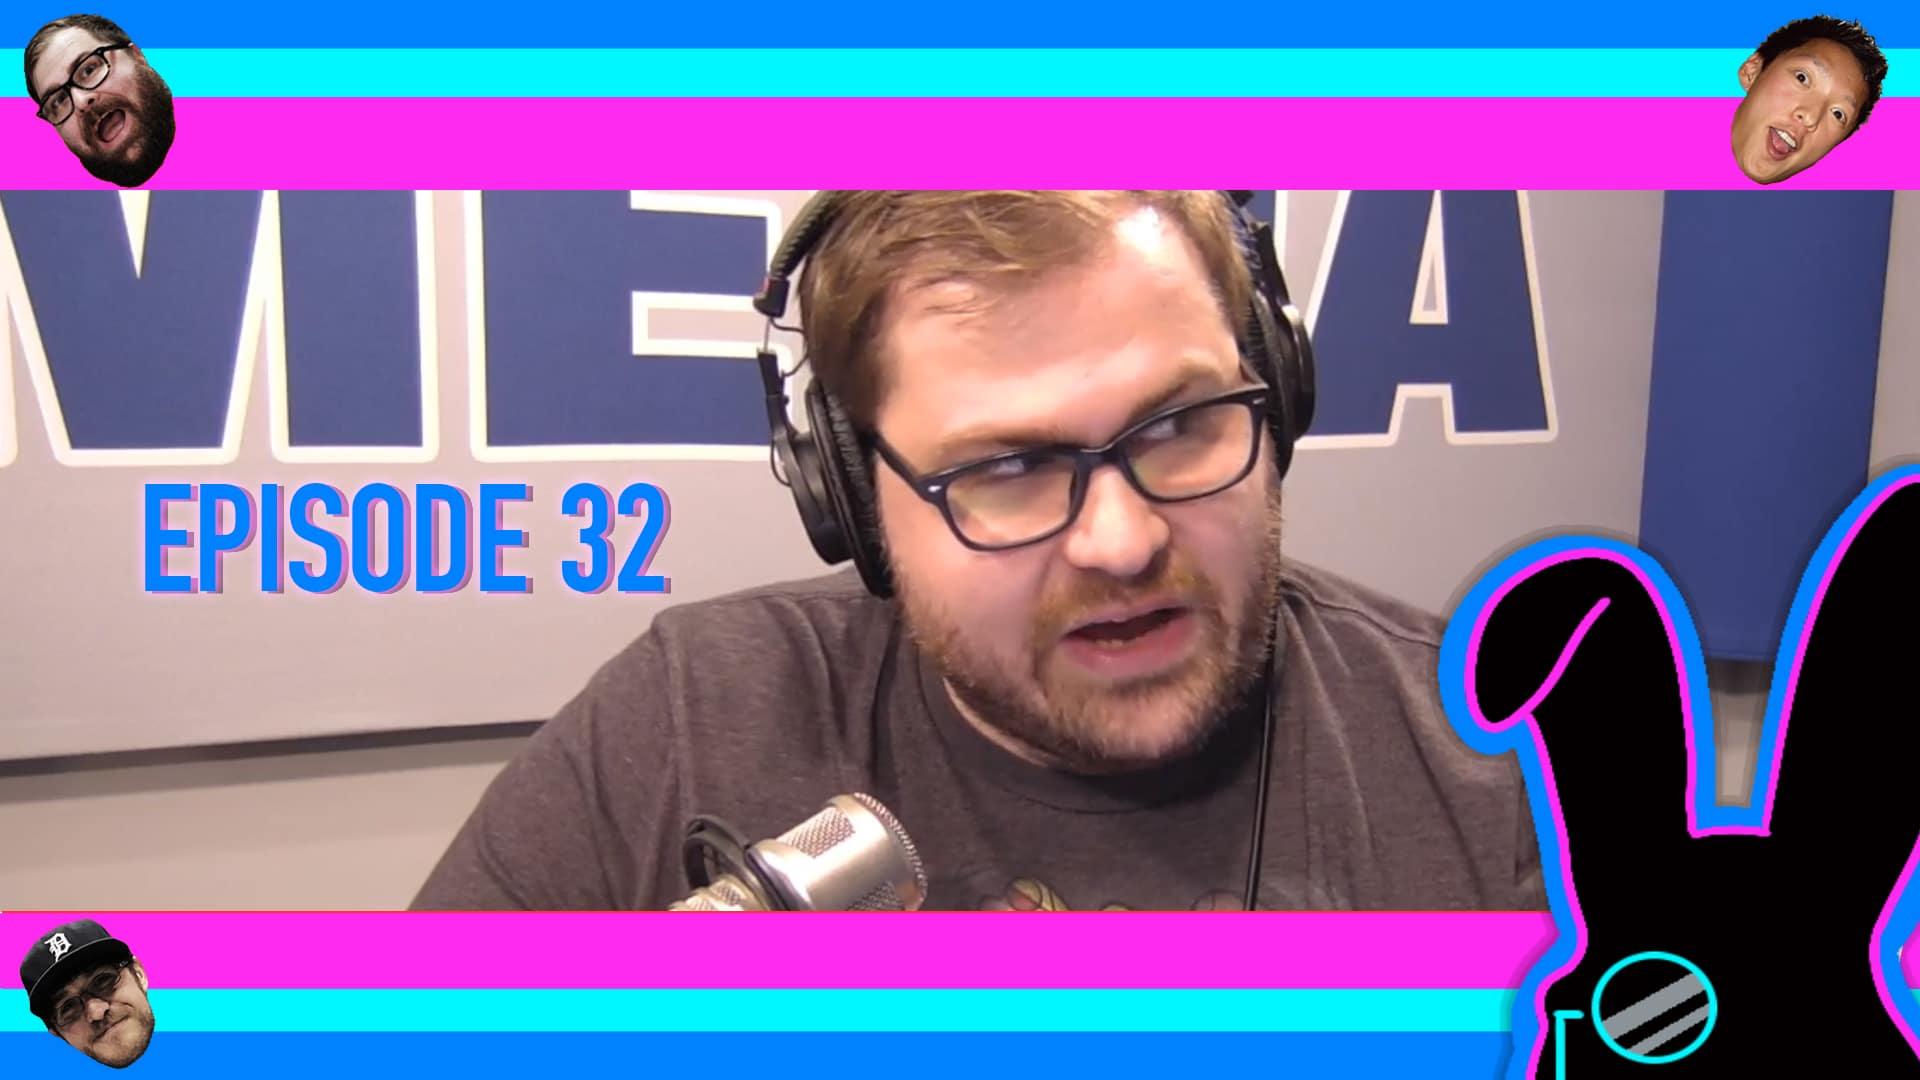 Geektainment Weekly - Episode 32